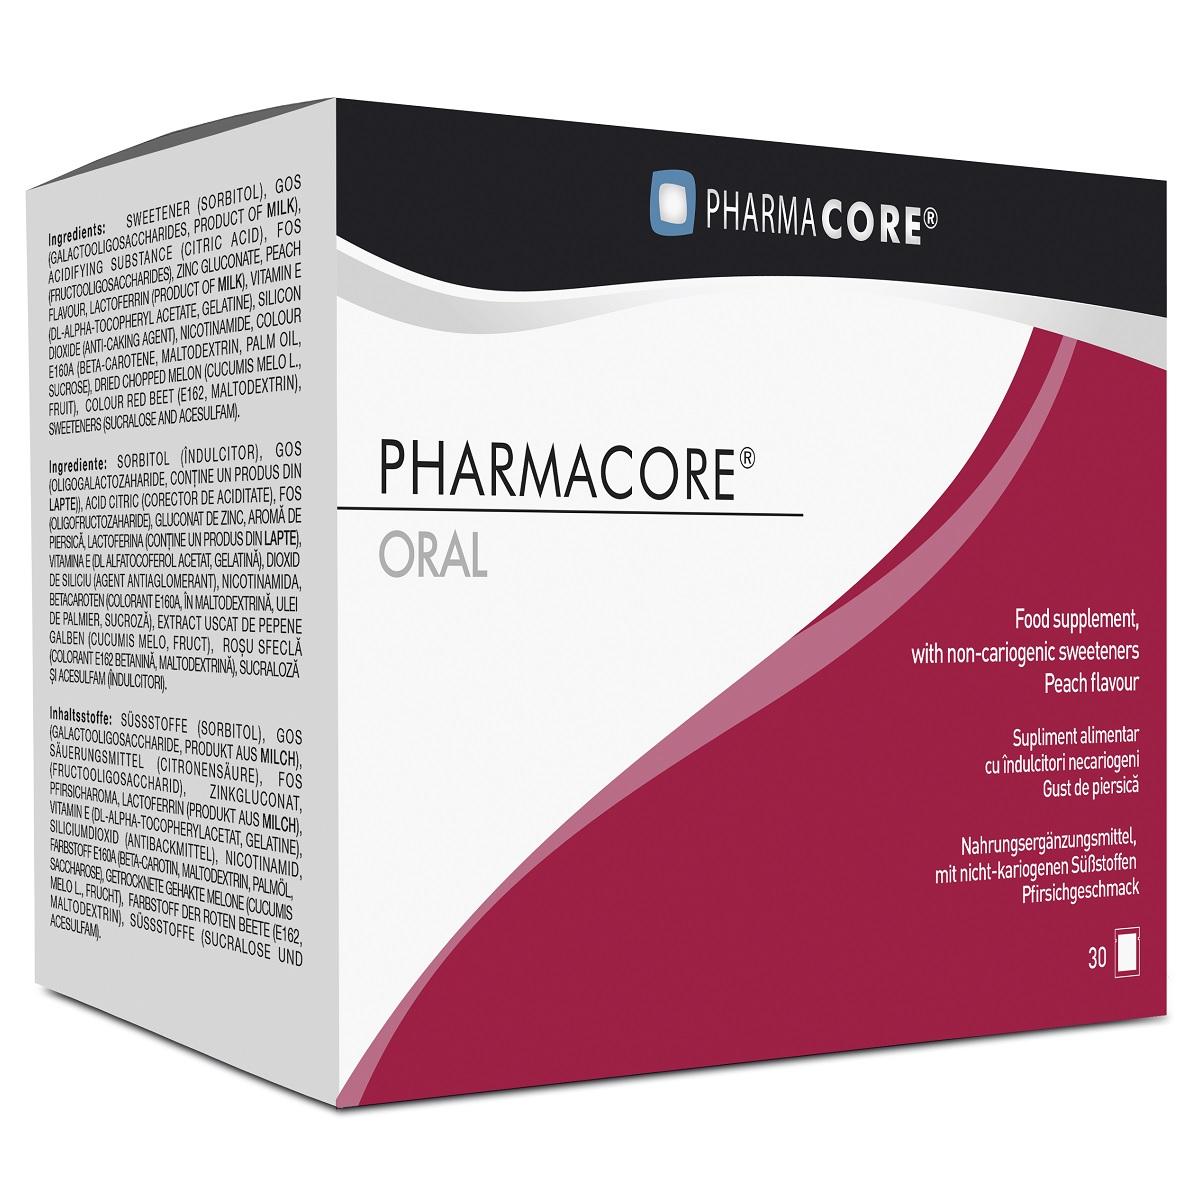 Supliment Oral Acne Control 90 mg, 30 plicuri, Pharmacore drmax.ro